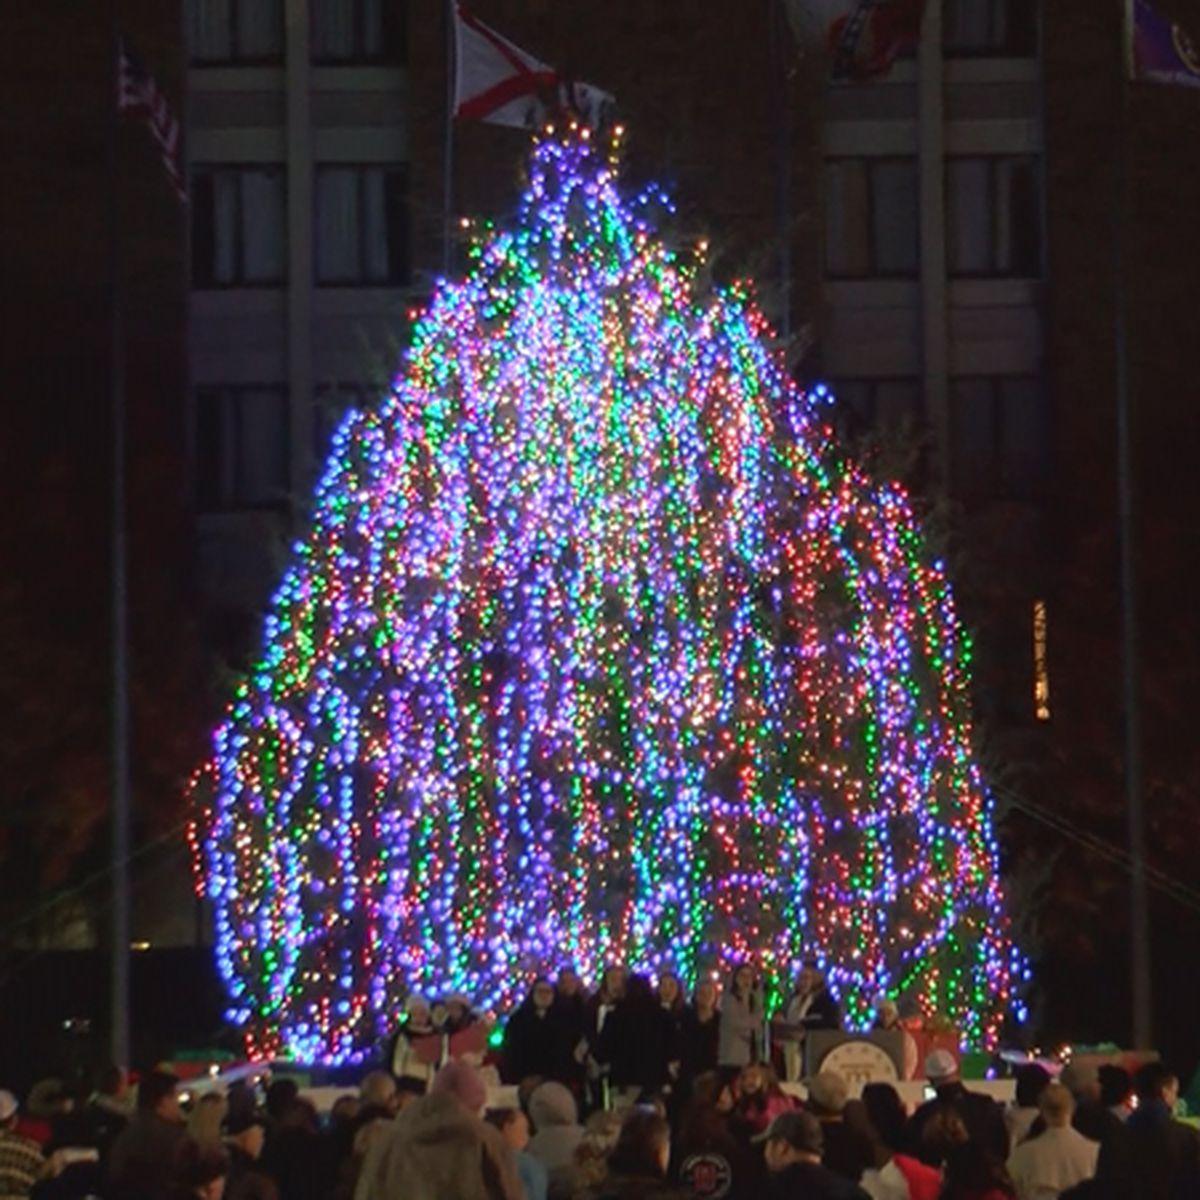 2019 Christmas events around Alabama